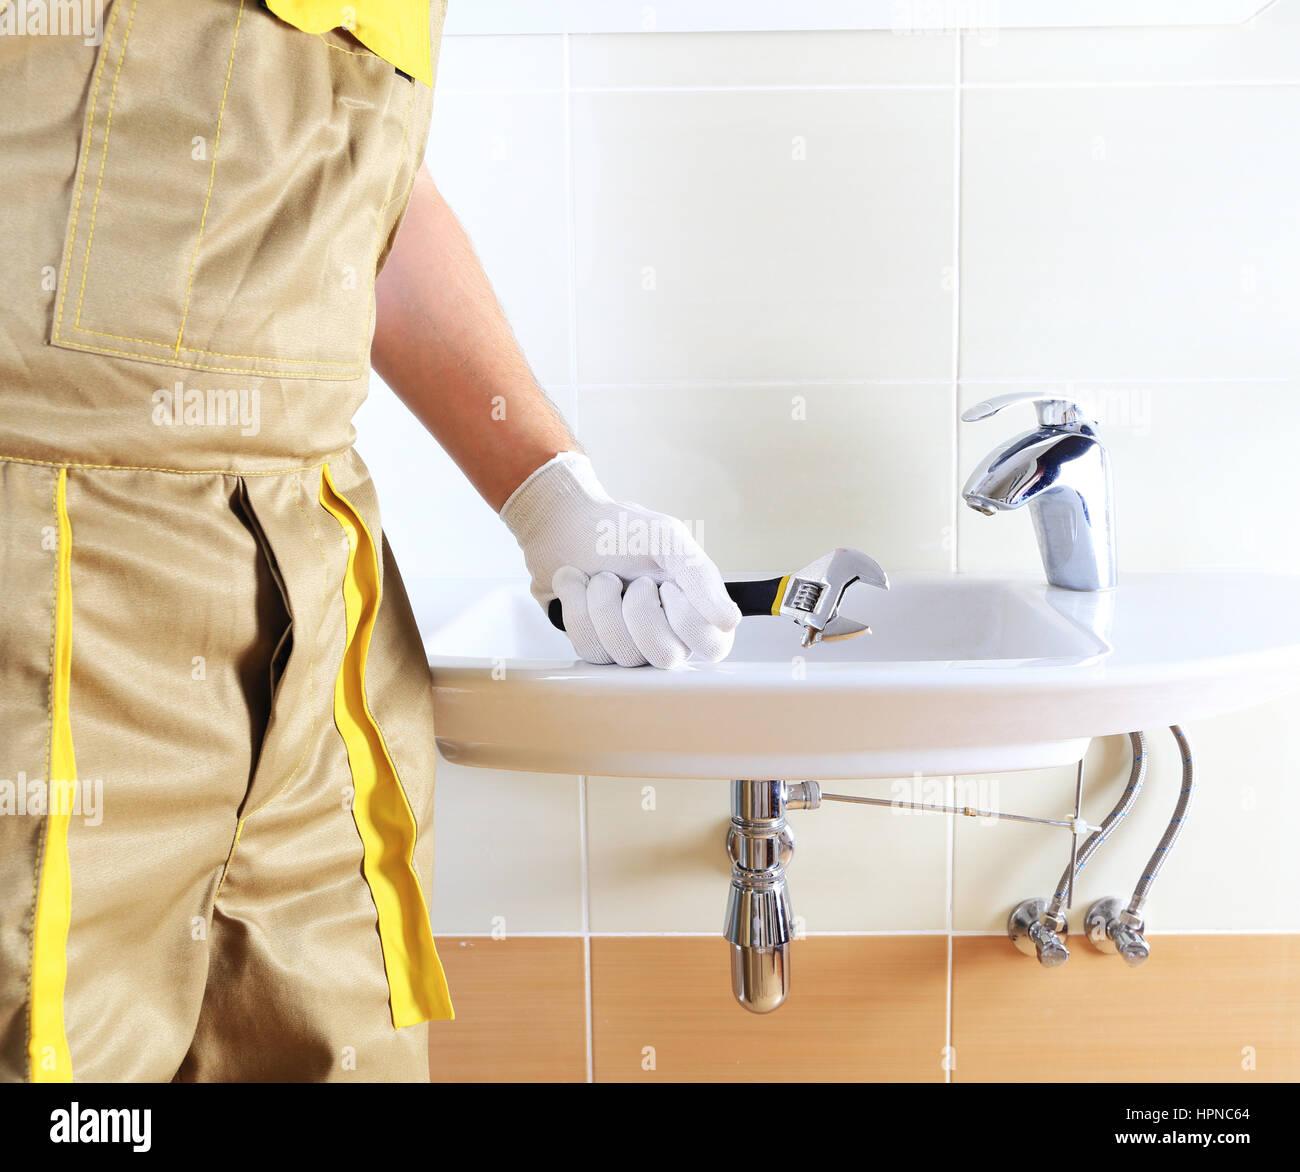 Plumber In Uniform In Bathroom. Plumber Holding Wrench